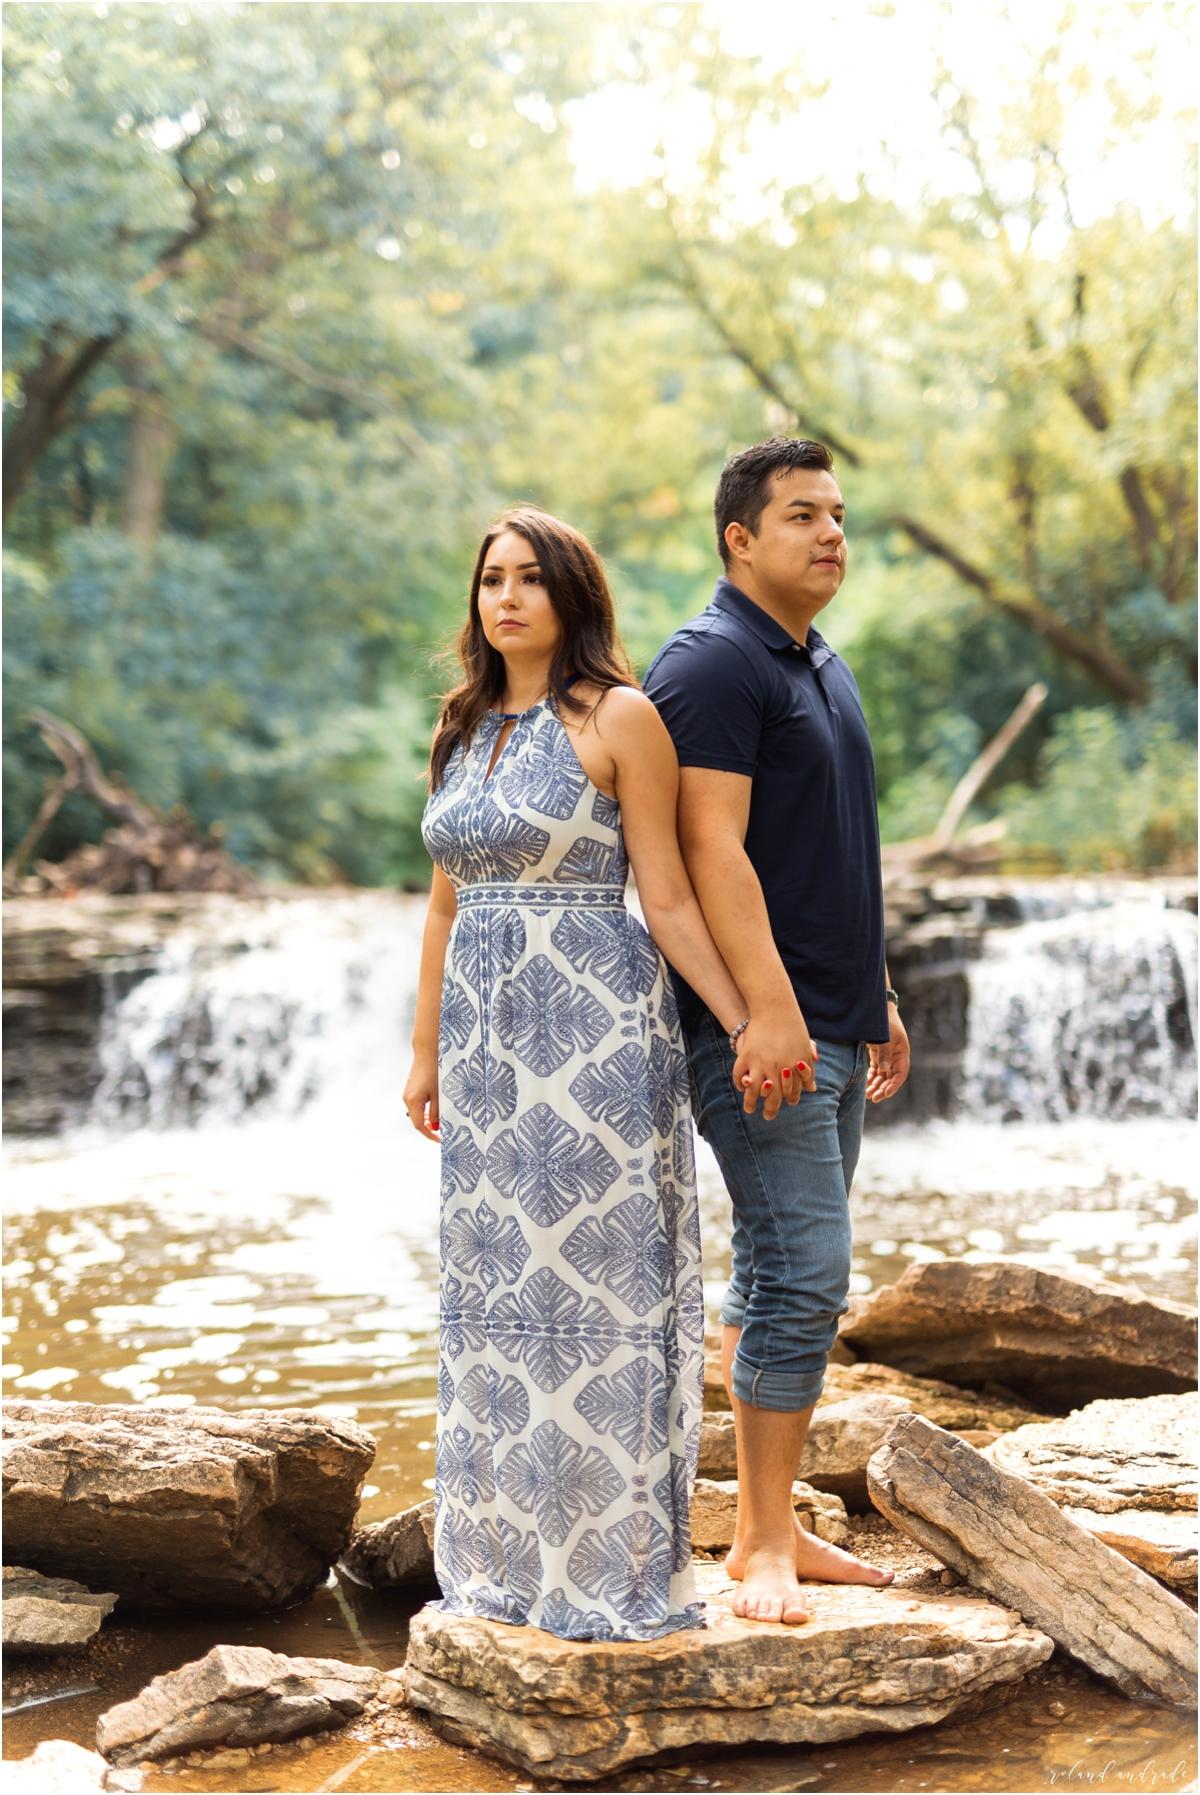 Waterfall Glenn Engagement Session, Lemont Illinois Engagement Session, Chicago Wedding Photographer, Naperville Wedding Photographer, Aurora Wedding Photographer35.jpg